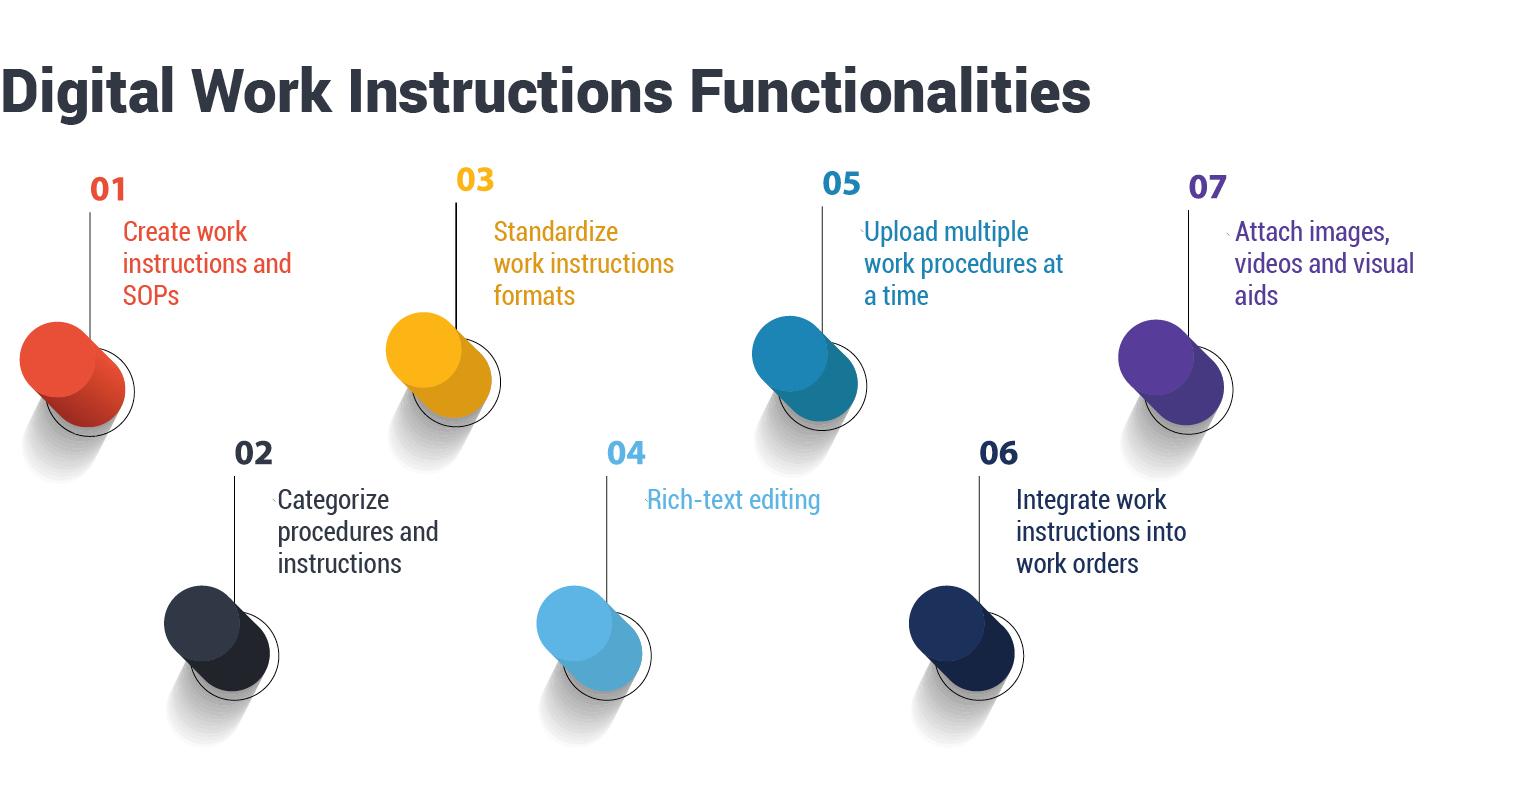 Digital-Work-Instructions-Functionalities-graphic